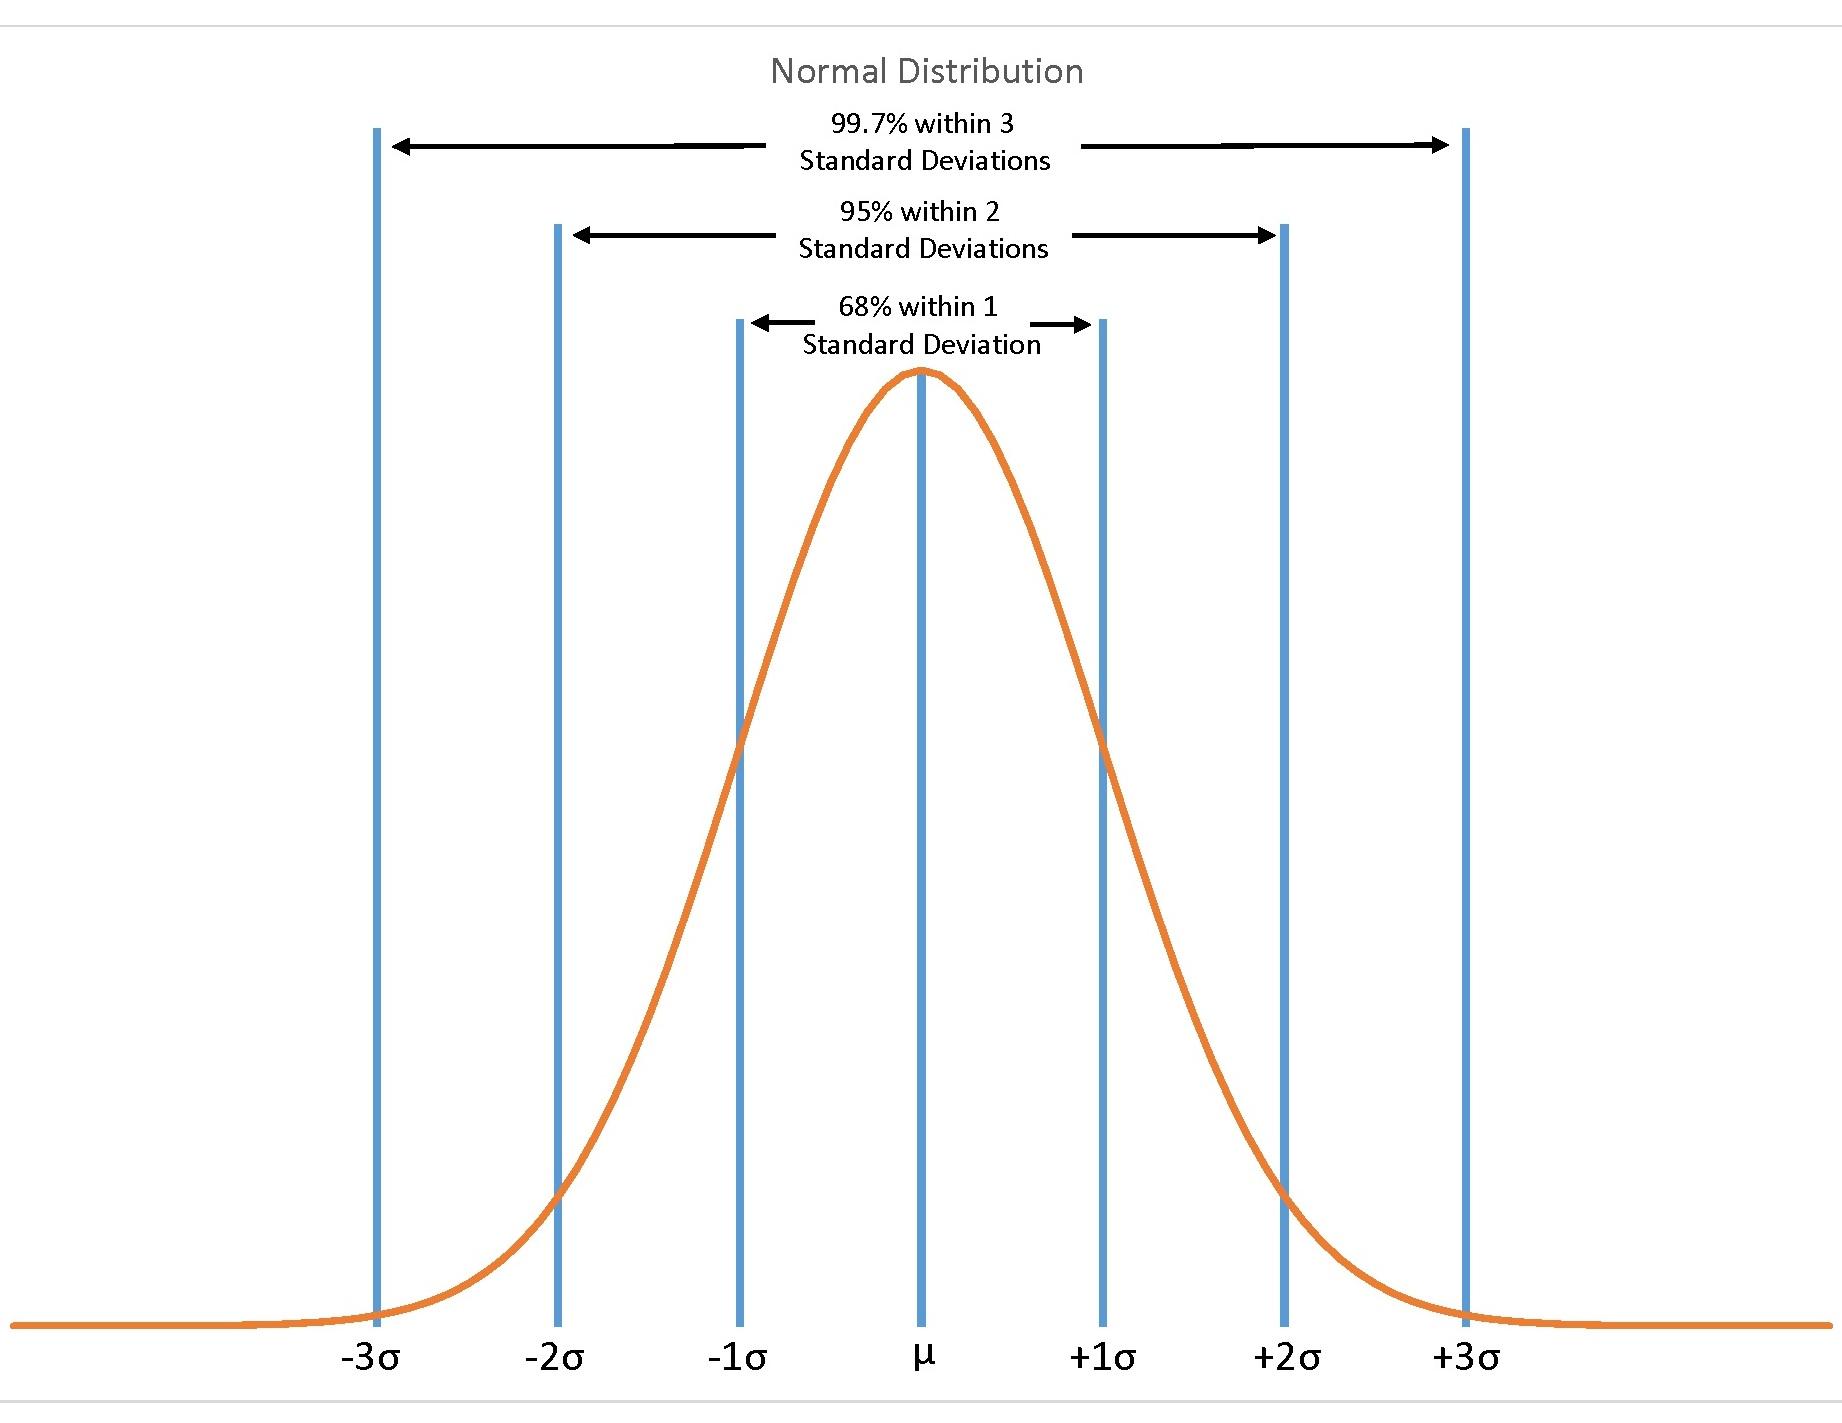 Flood - Normal Distribution